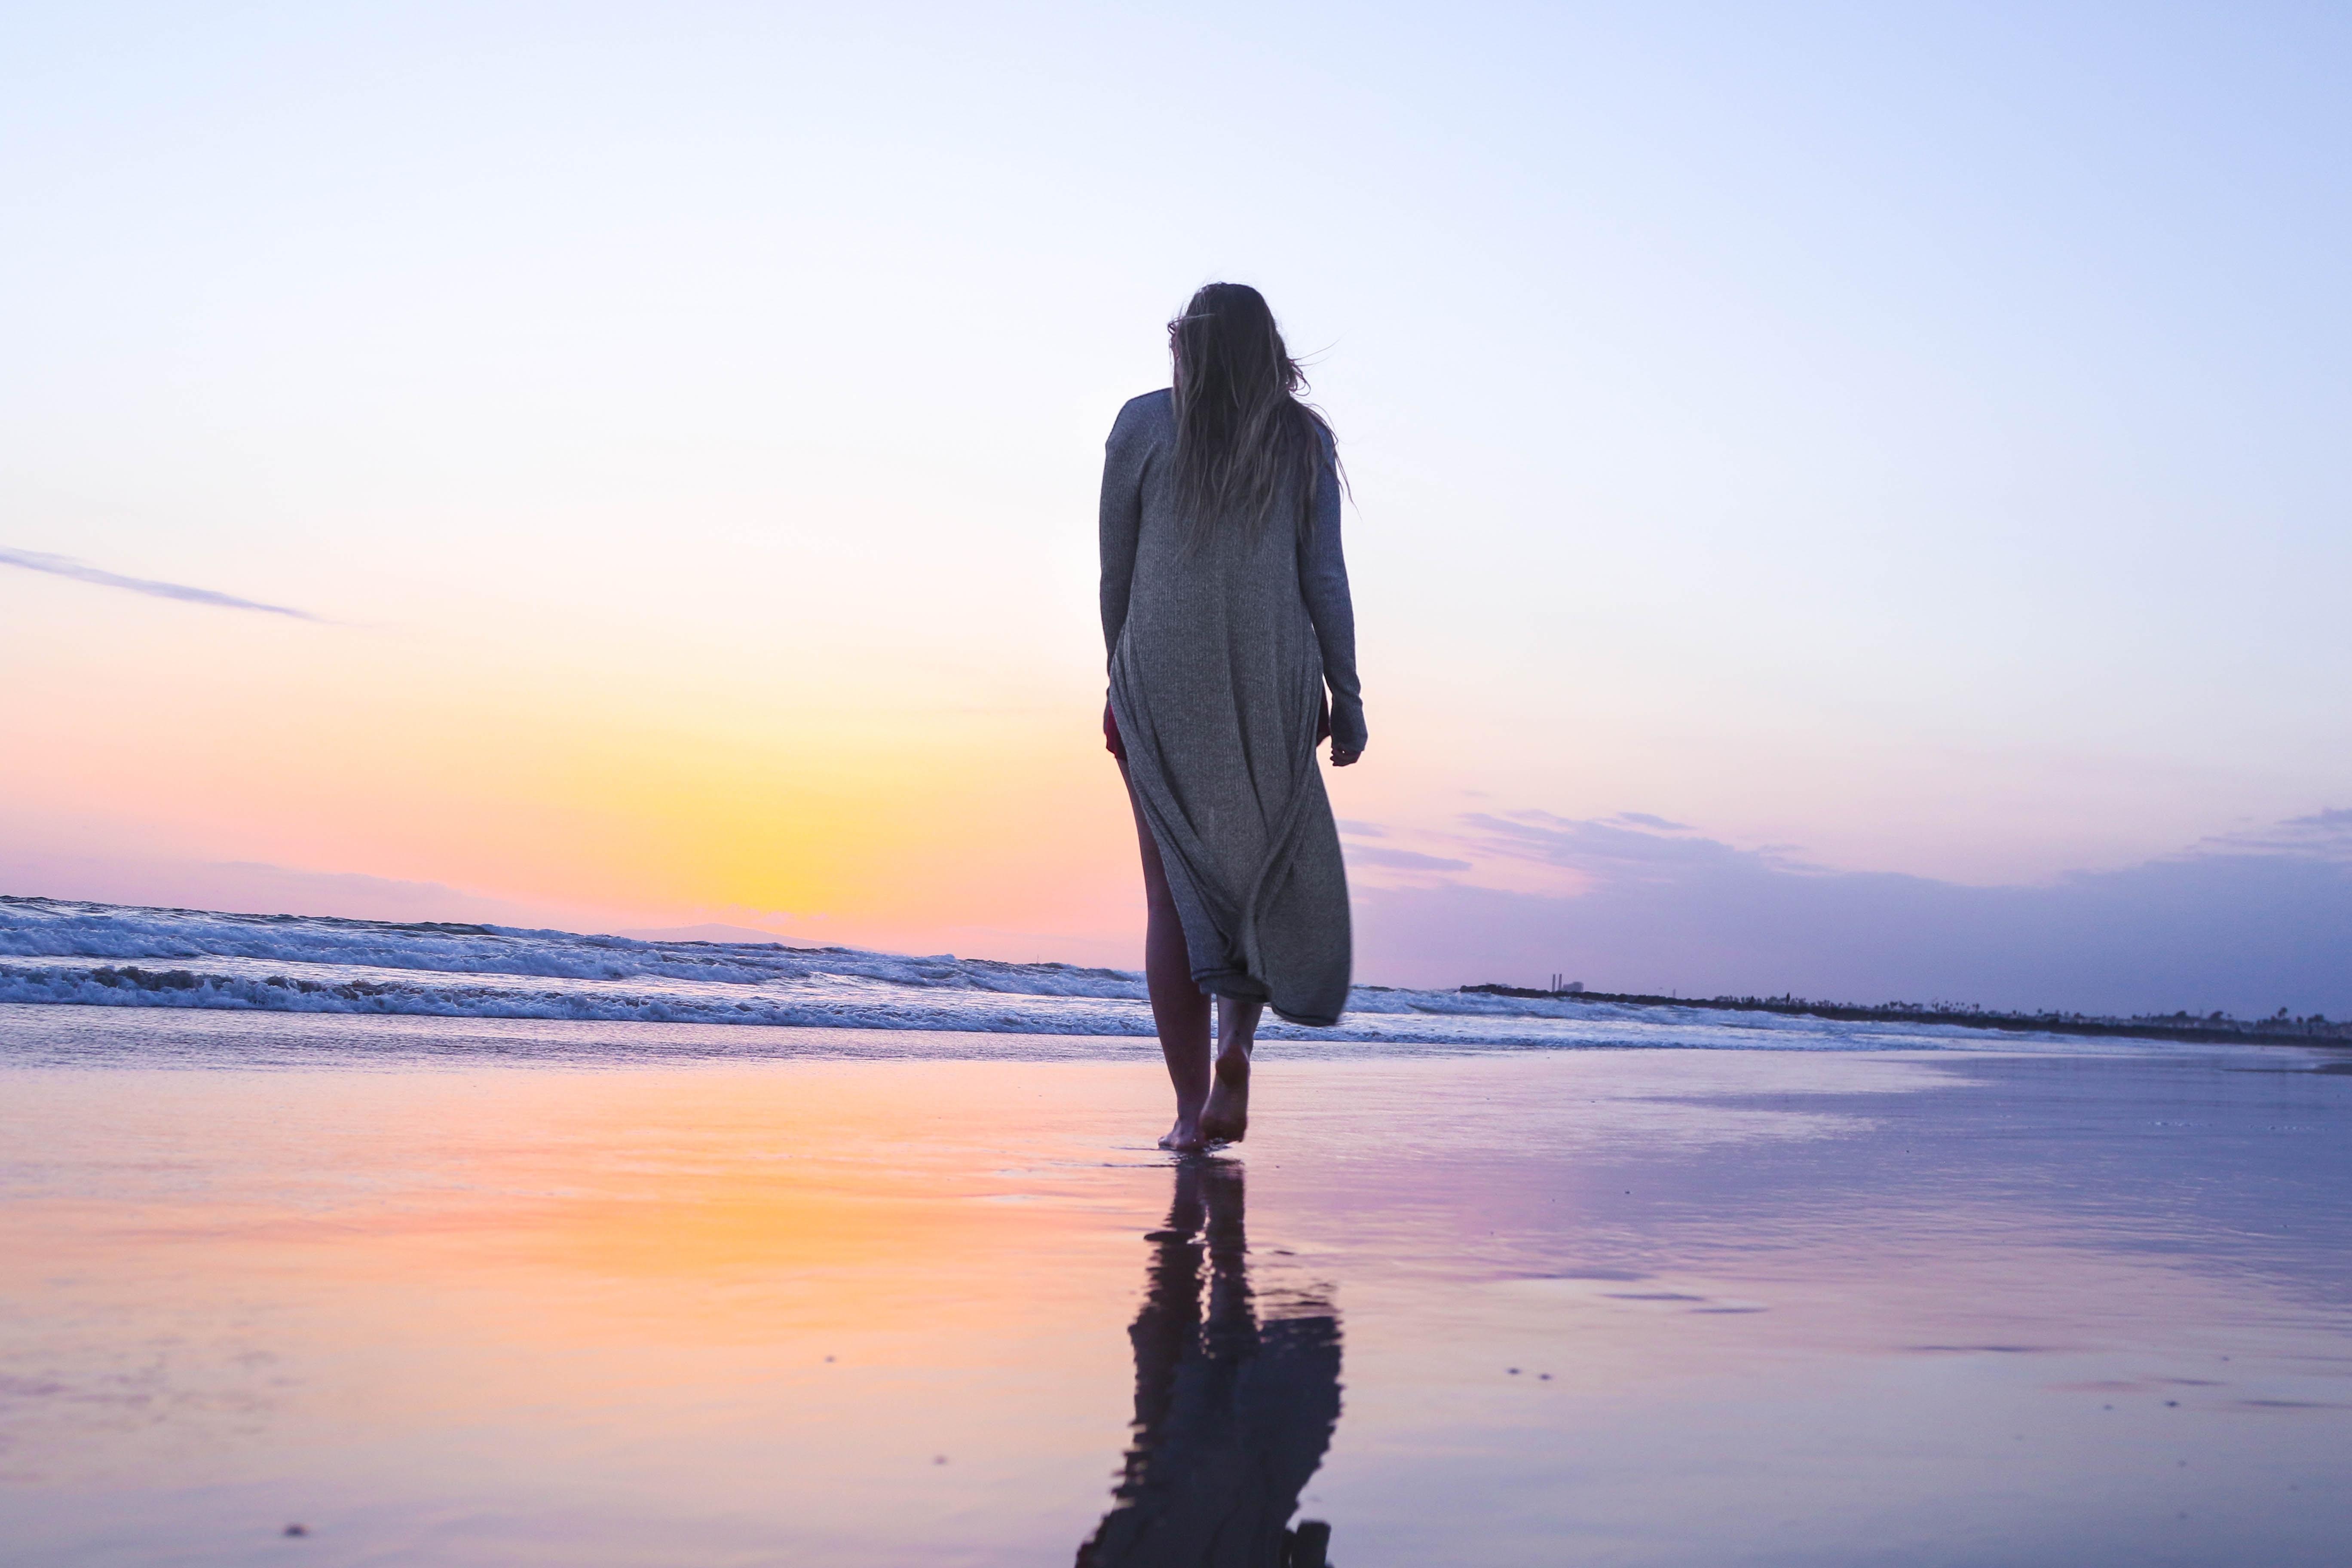 Woman walking on a wet sand beach towards the sunset at Newport Beach